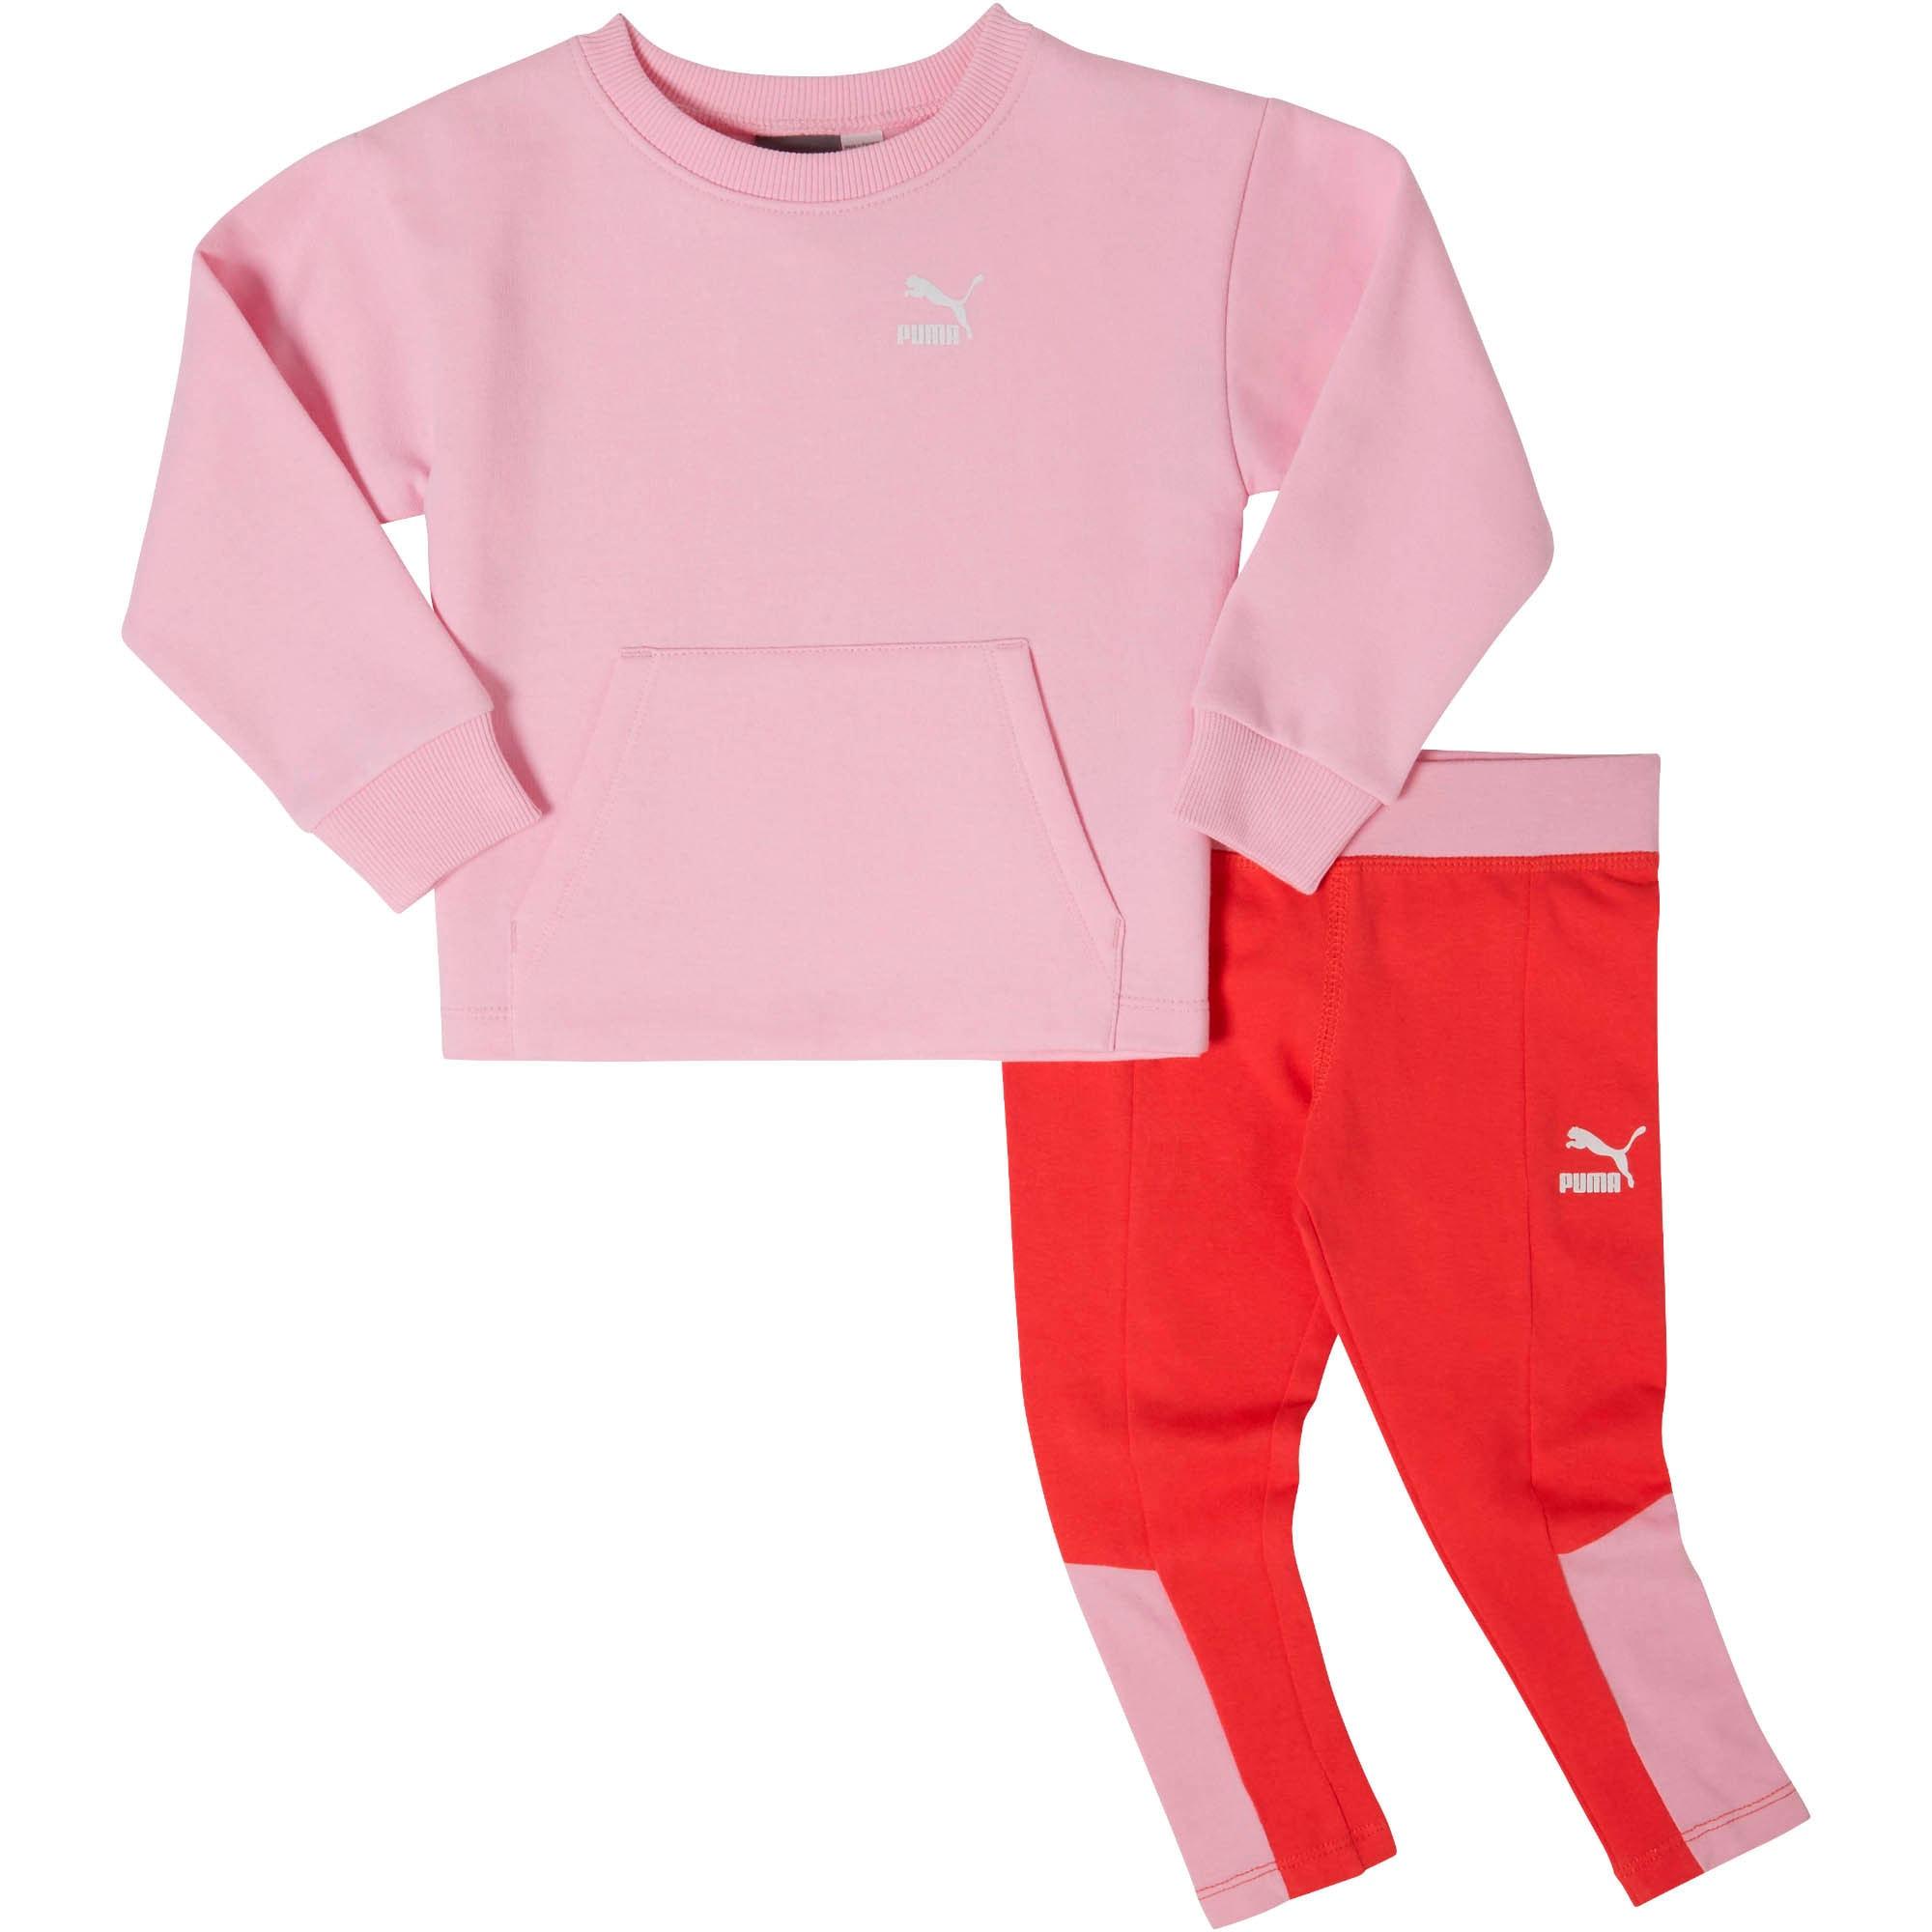 Thumbnail 1 of Infant + Toddler Fleece Crew Pullover + Cotton Spandex Leggings Set, PALE PINK, medium